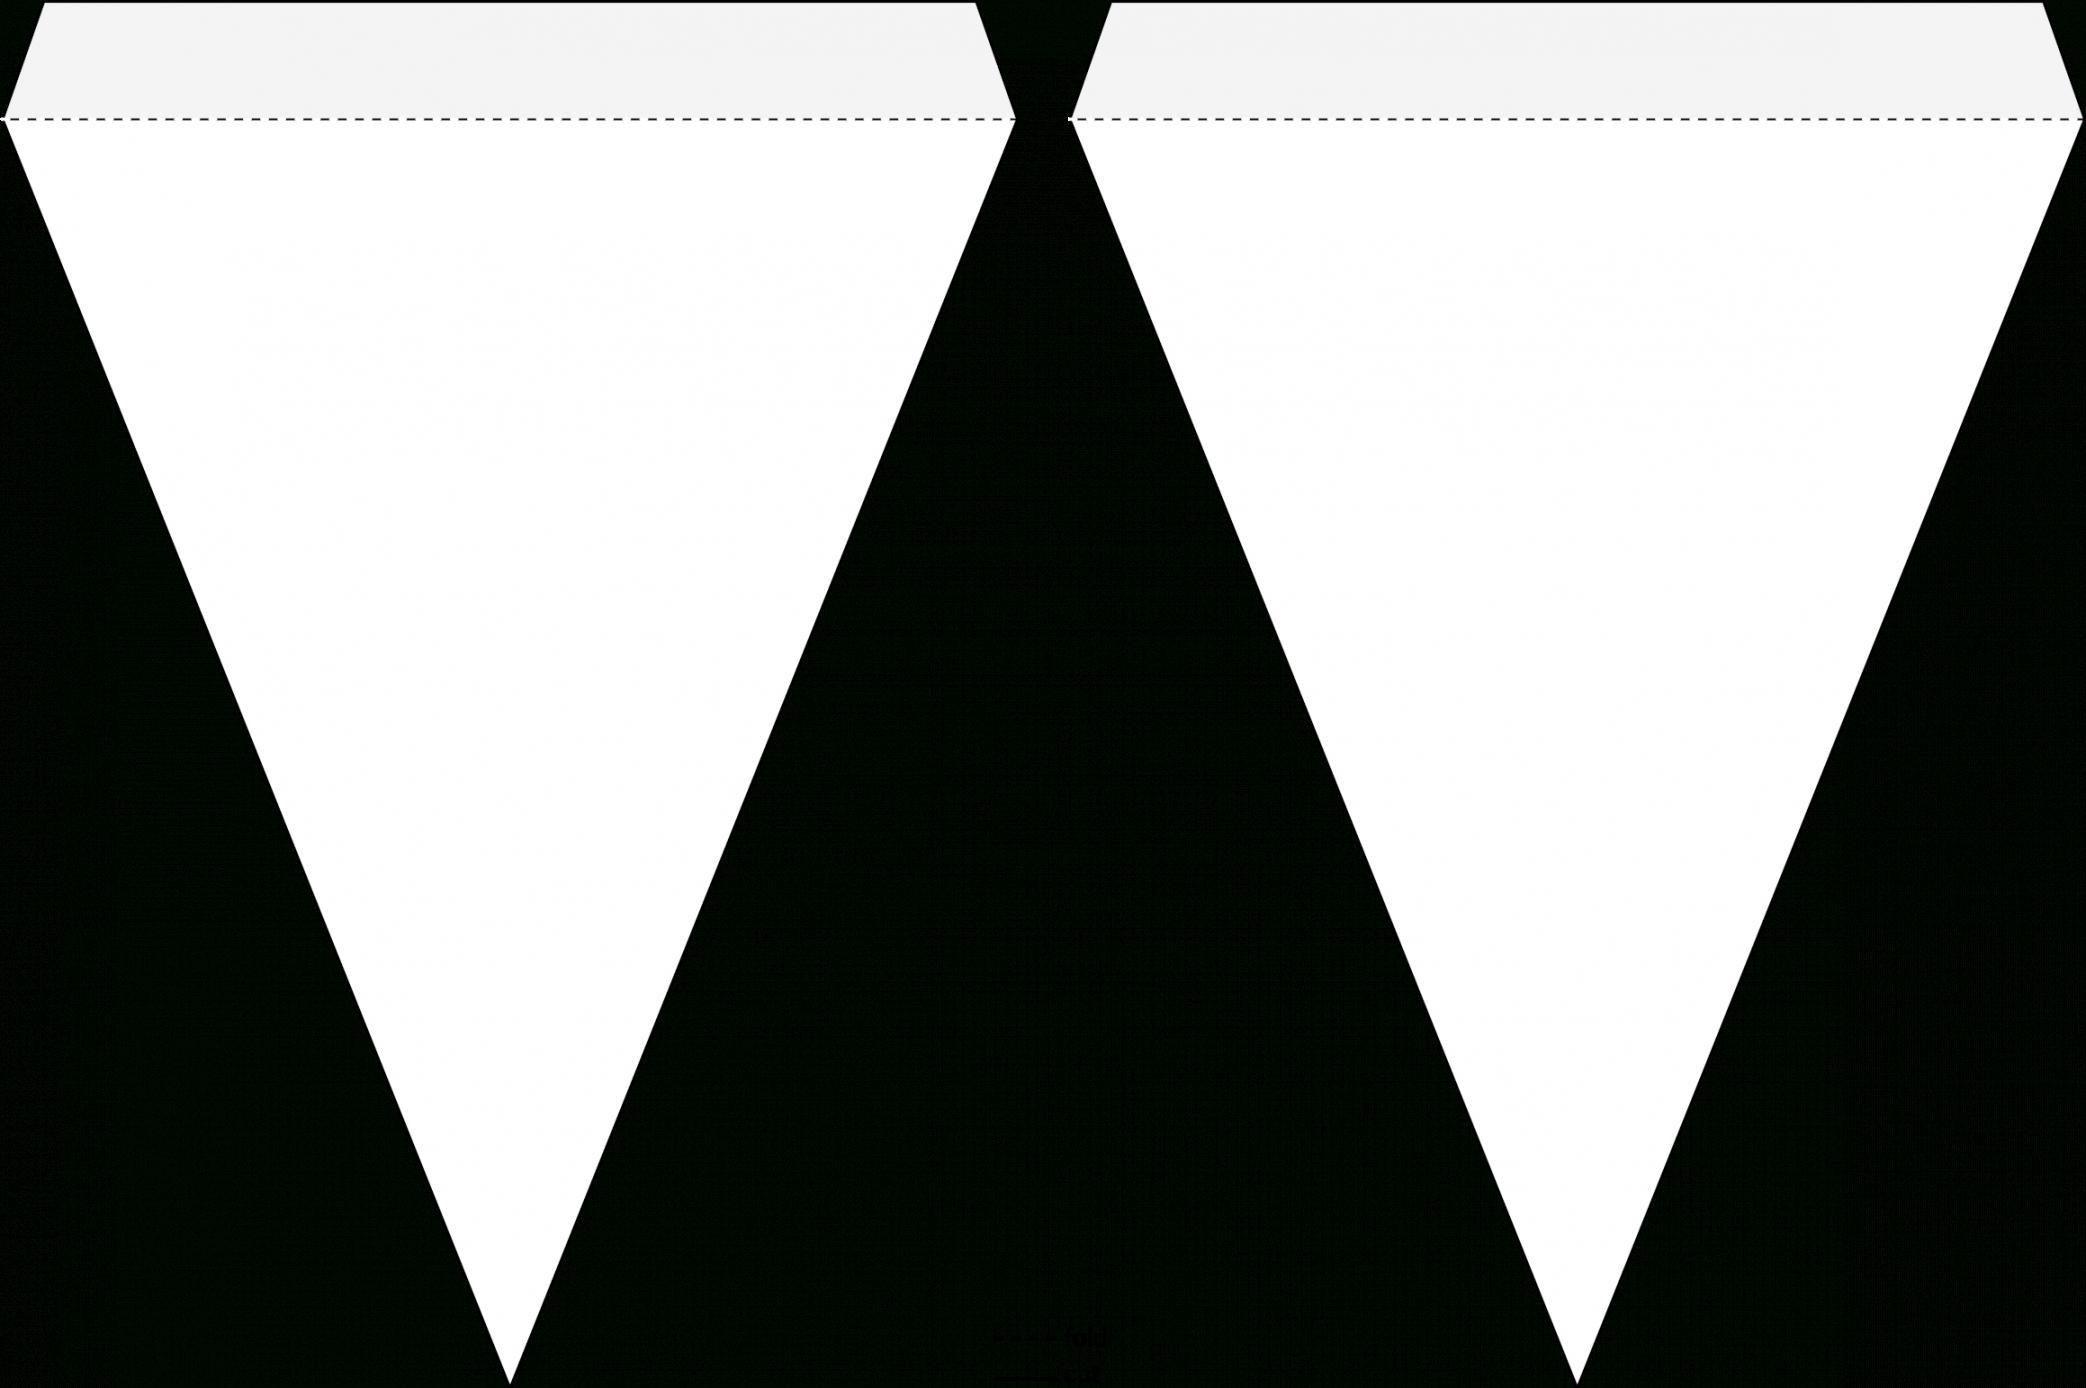 editable pennant banner template  triangle flag banner template triangle flag banner template doc